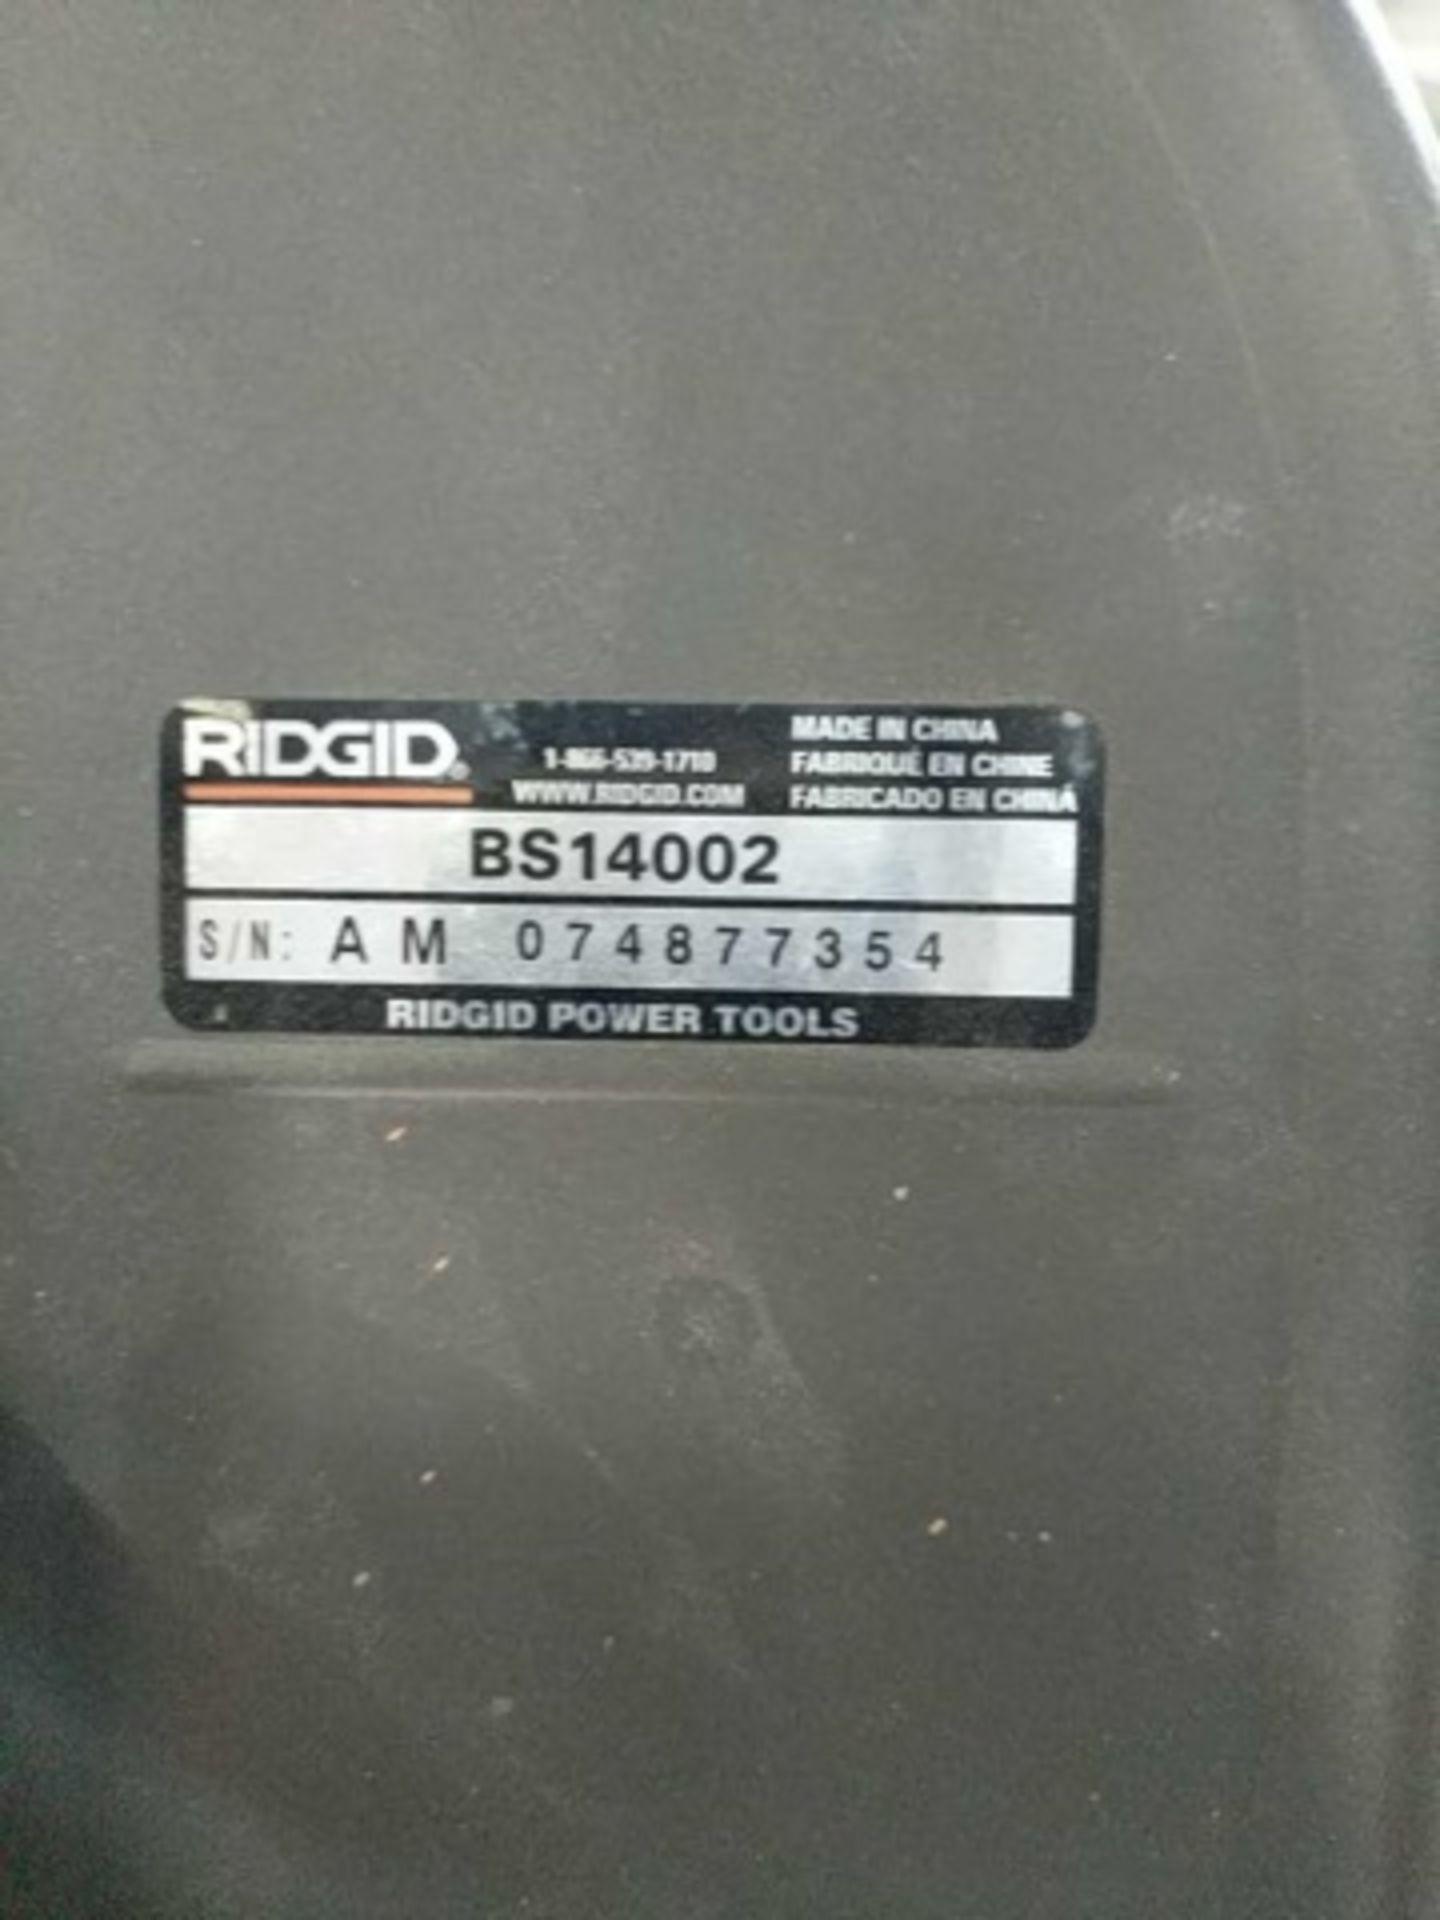 Lot 123 - Ridgid Bs14002 Vertical Bandsaw